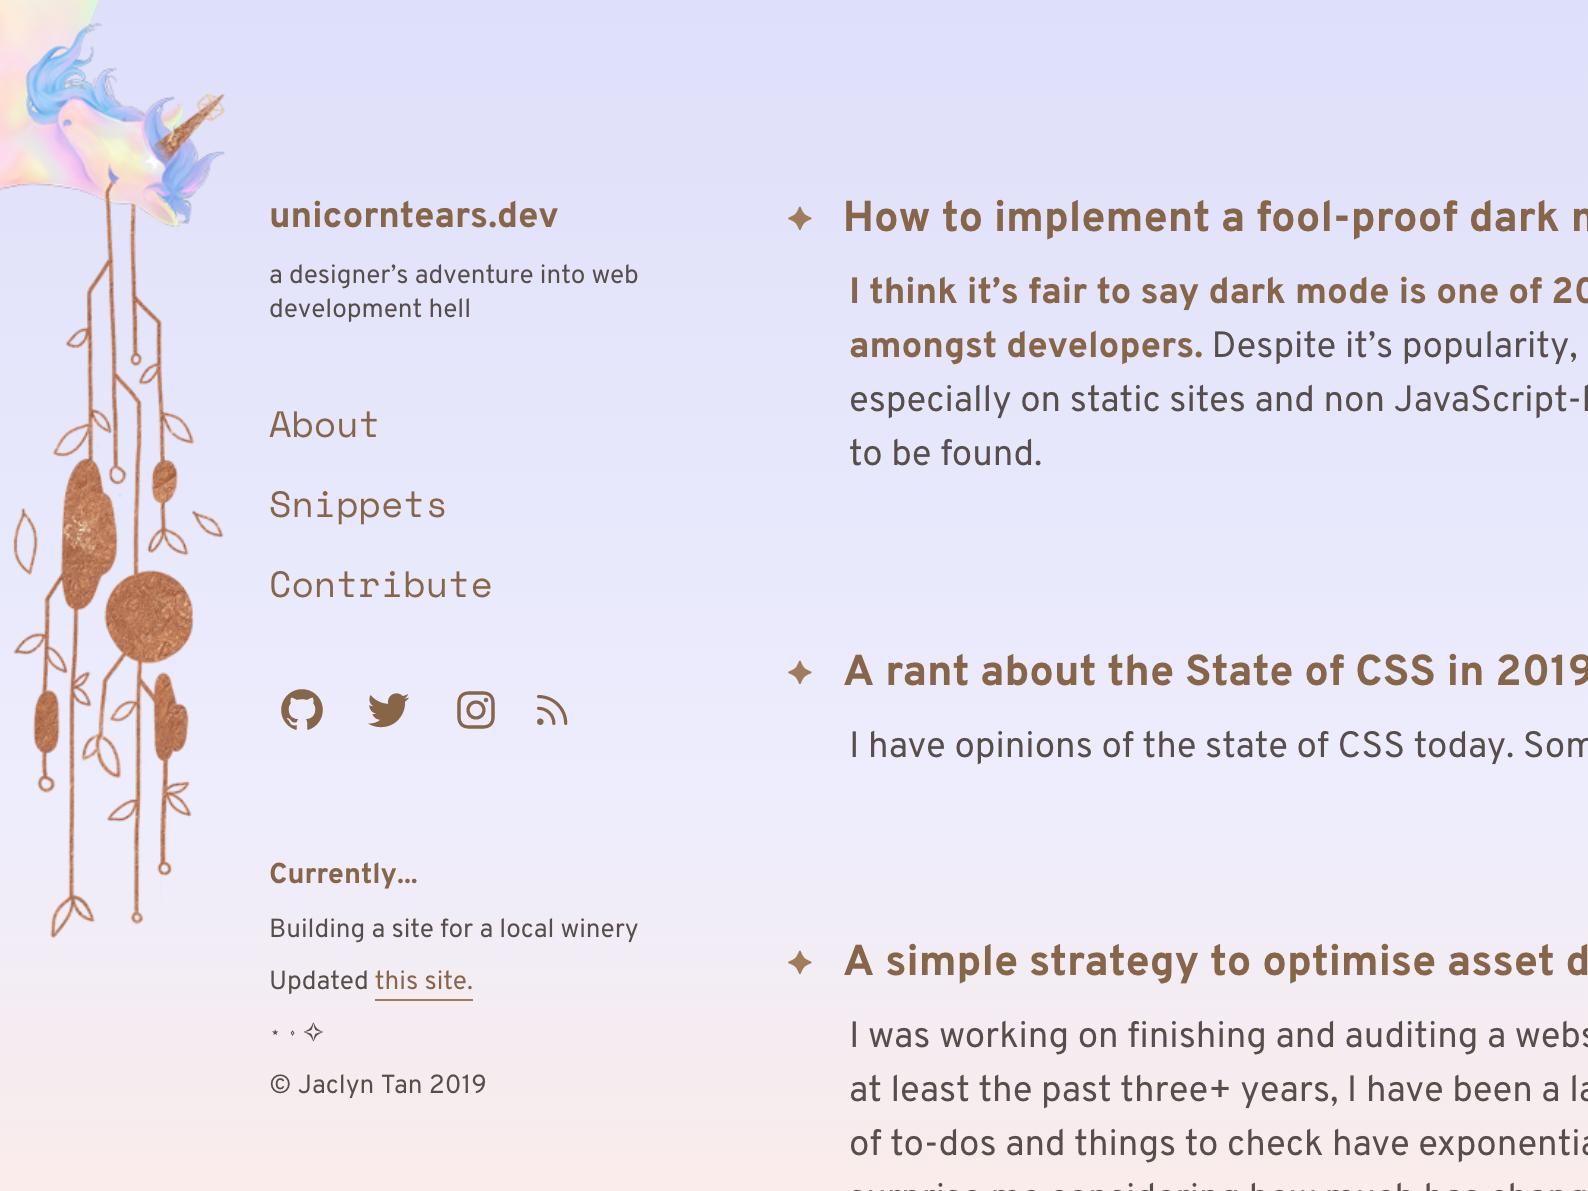 unicorntears.dev aesthetic webdev personalsite blog webdesign design digital pastel